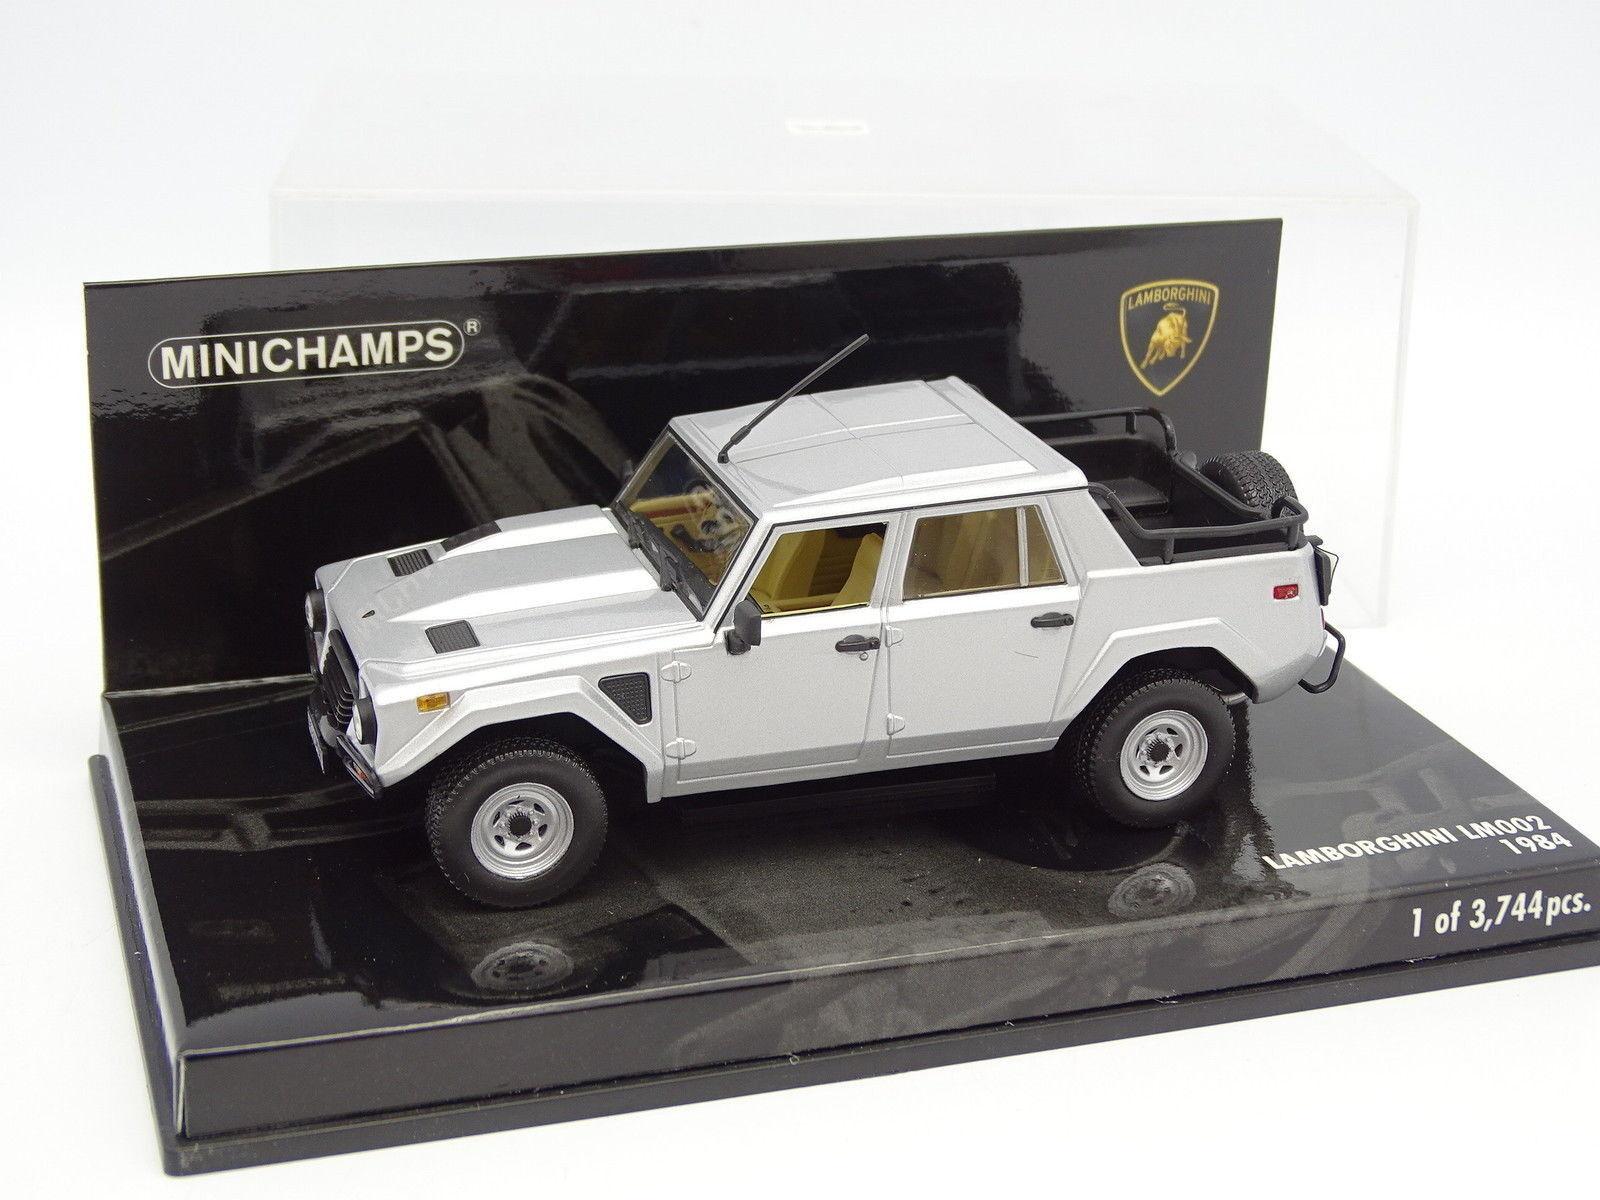 Minichamps 1 43 - Lamborghini LM002 Grey